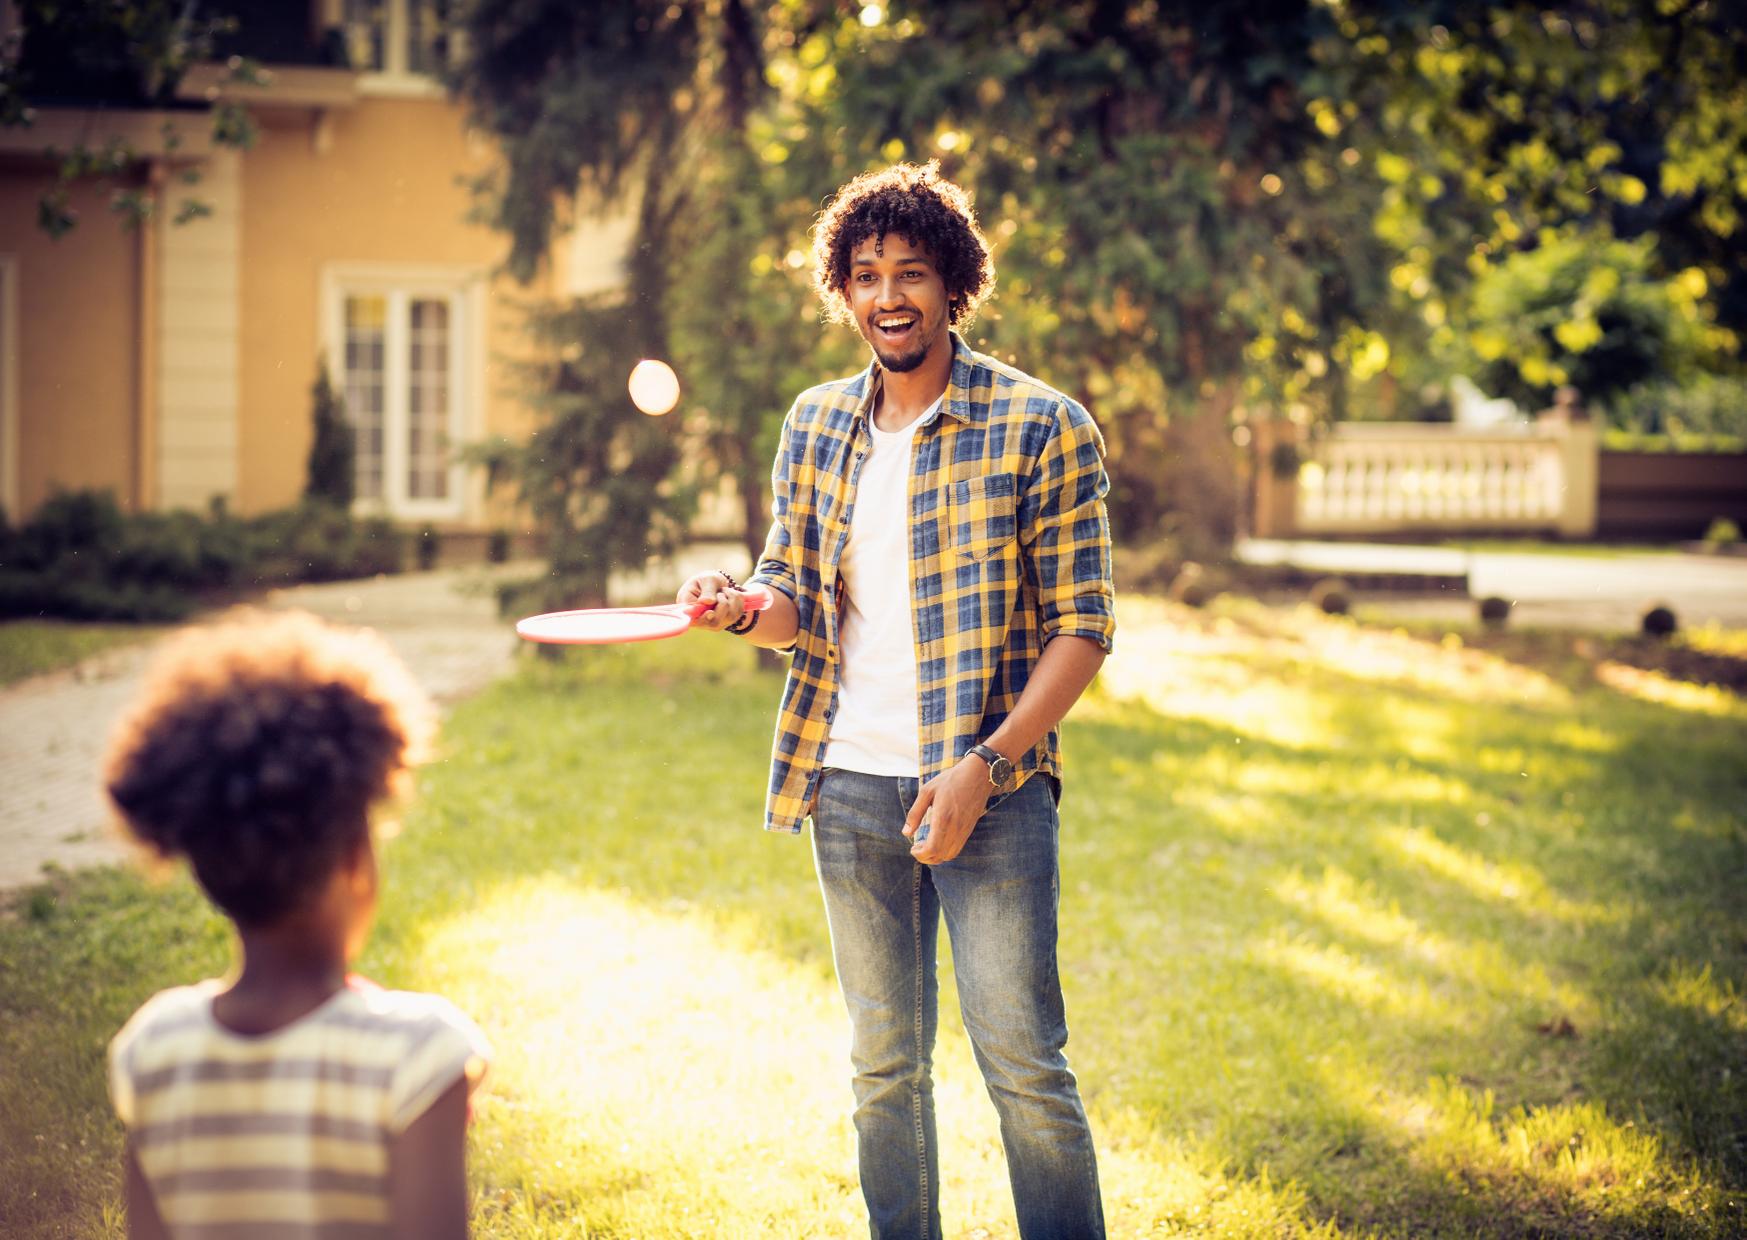 Man having fun with kids in backyard in Fun Things to Do In your Backyard When You Are Bored